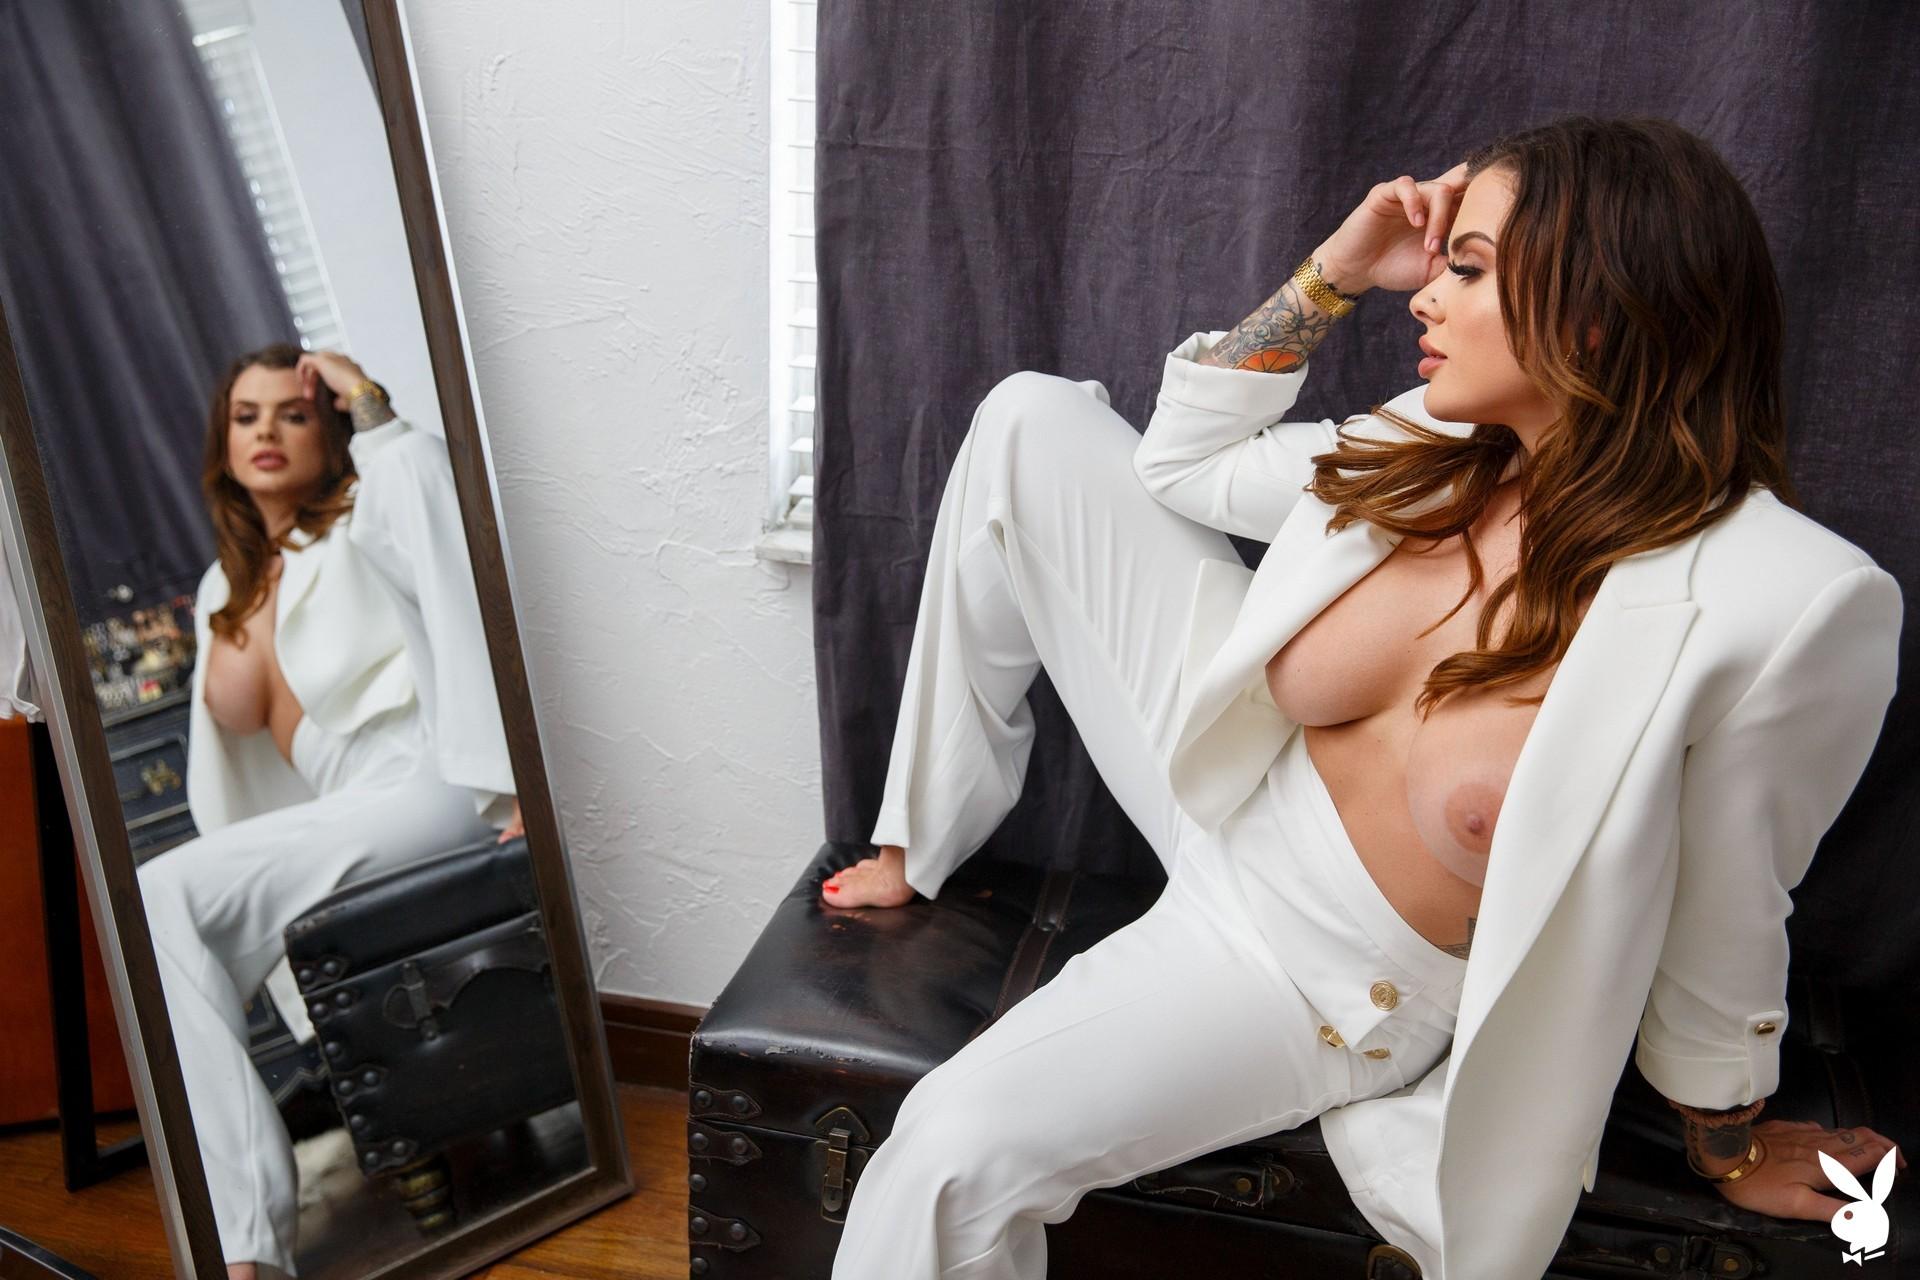 Keisha Grey In Change Of Heart Playboy Plus (24)